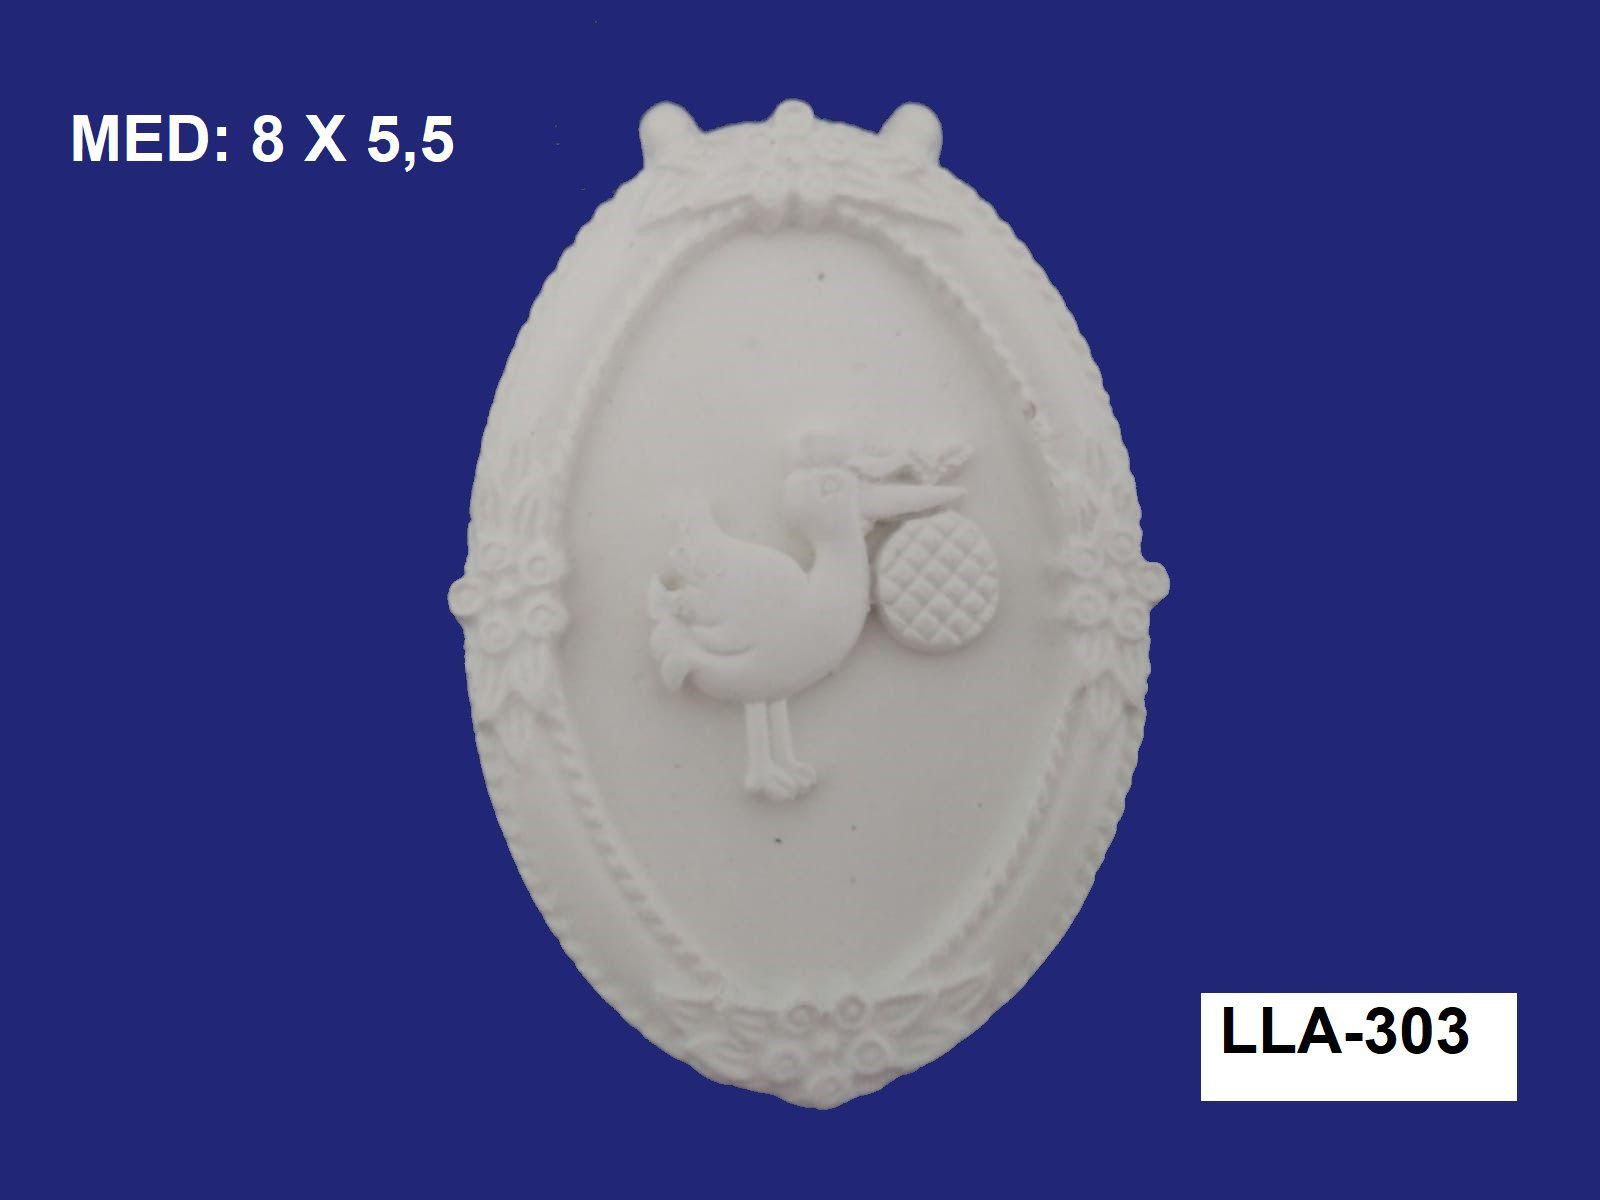 LLA-303 APLIQUE CEGONHA 8X5,5CM